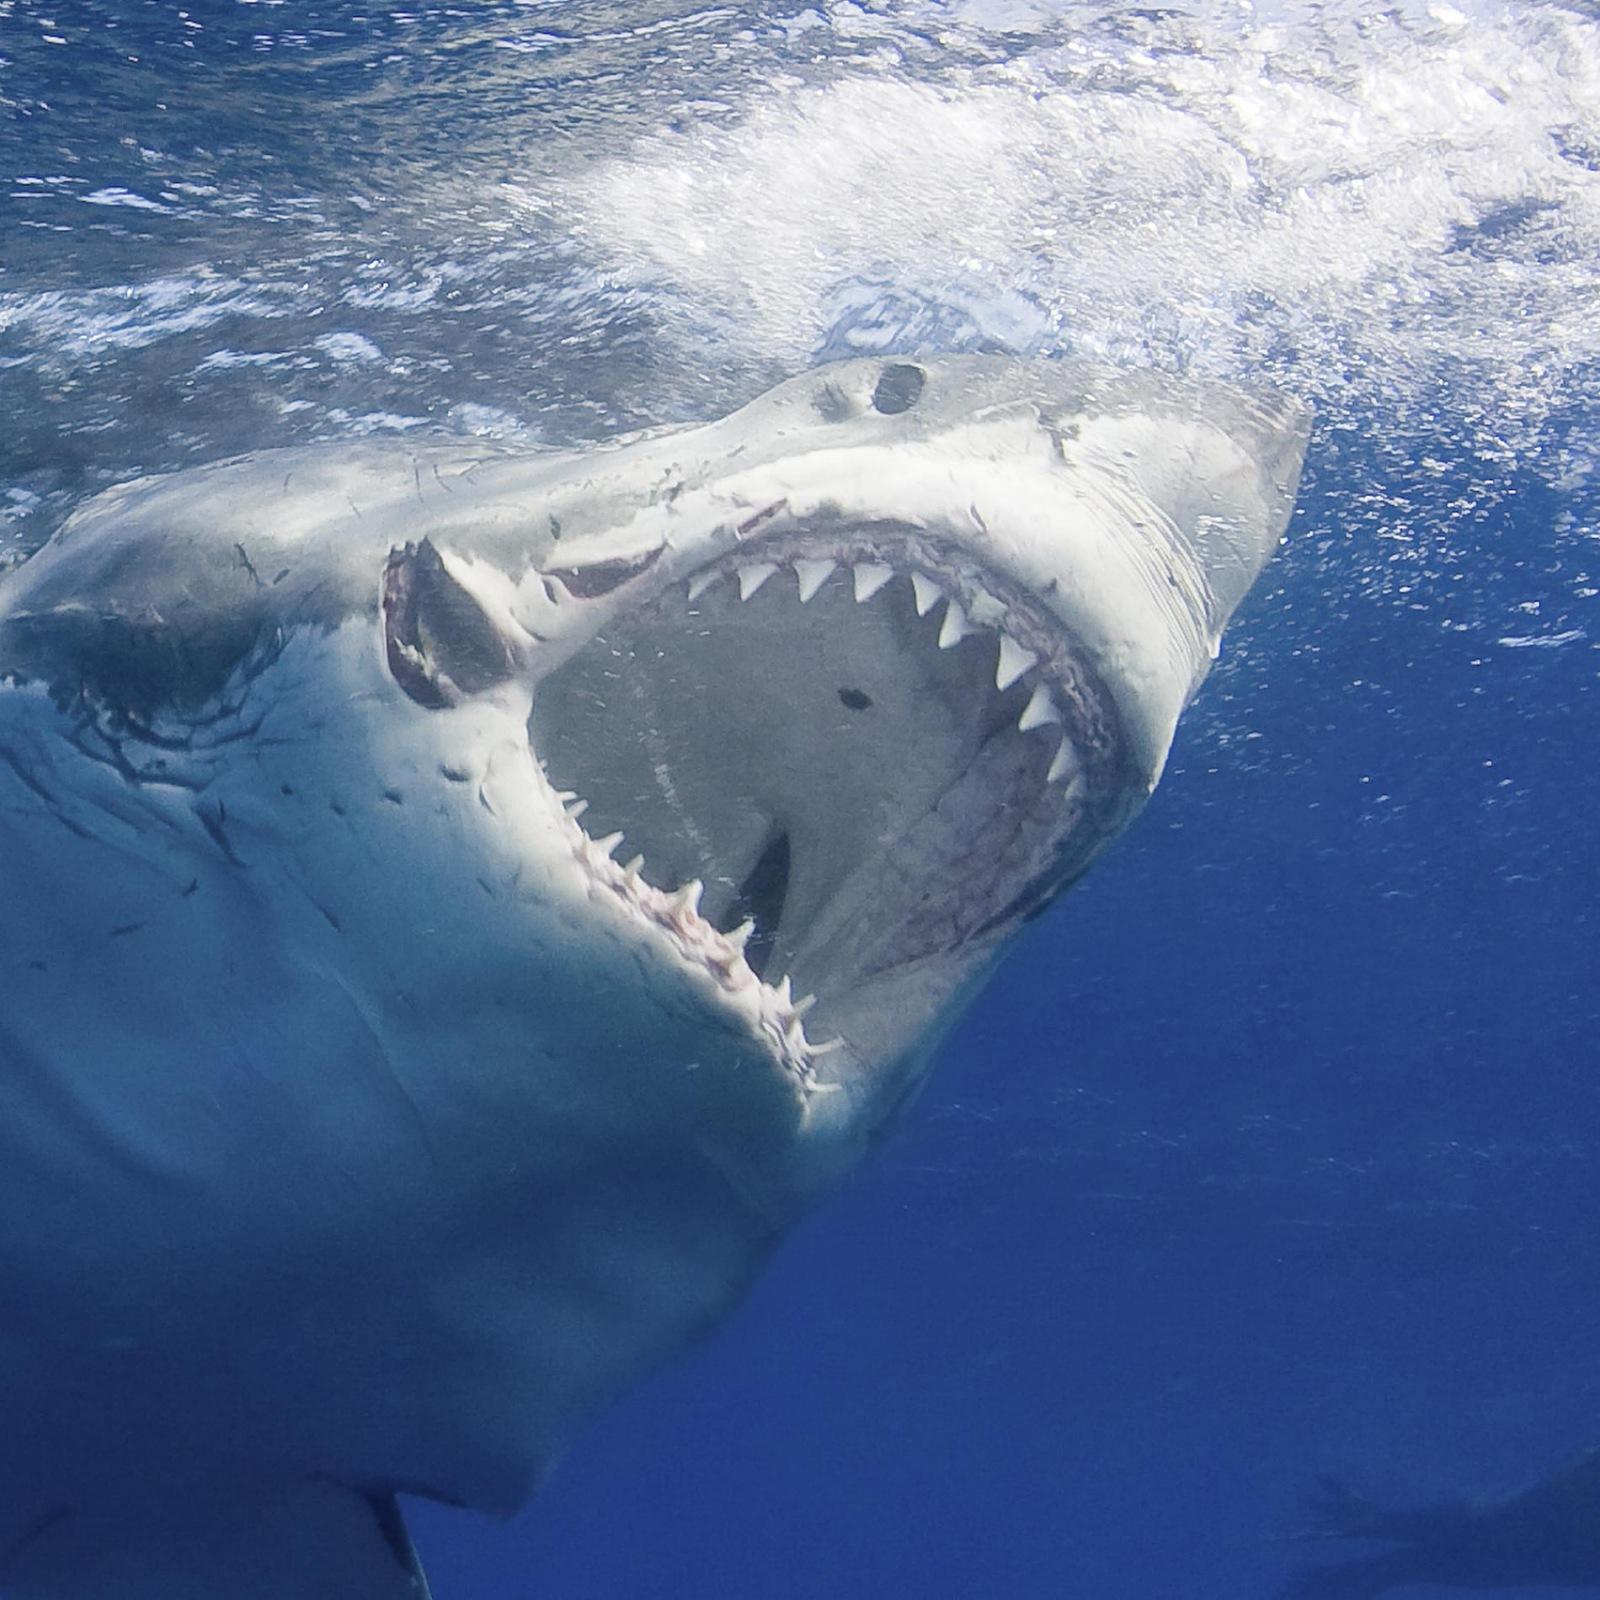 5e71272098a00_great-white-shark_thumb.ngsversion.1498145420427.adapt_1900_11.jpg.fefe1e340177a77ae7a7afa51e08b1b4.jpg